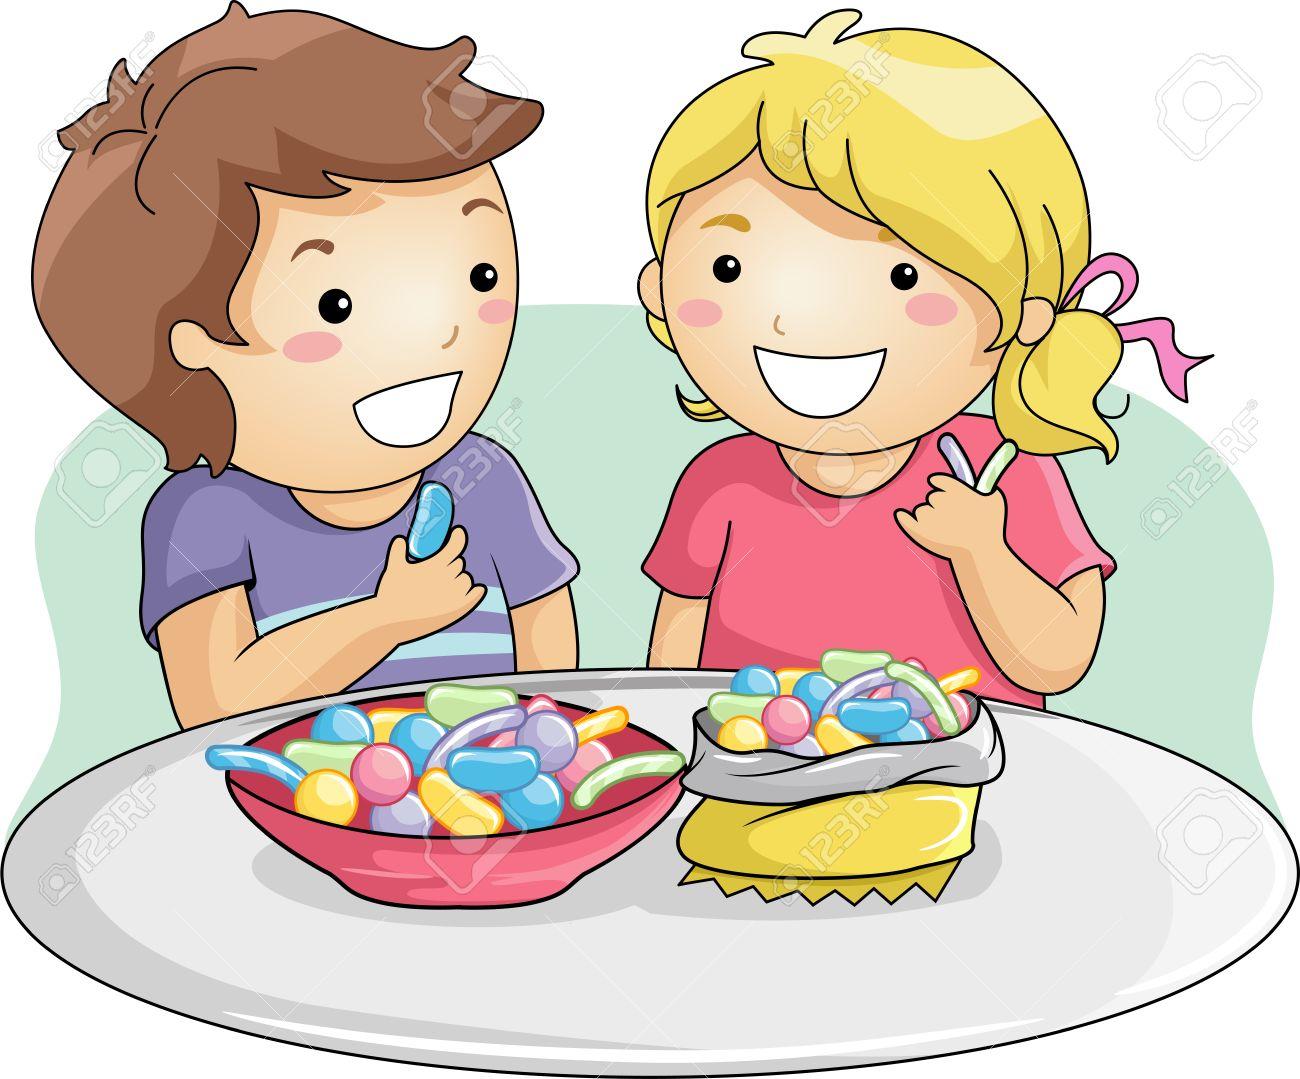 Illustration Of Little Kids Eating Gummy Candies Stock Photo ...